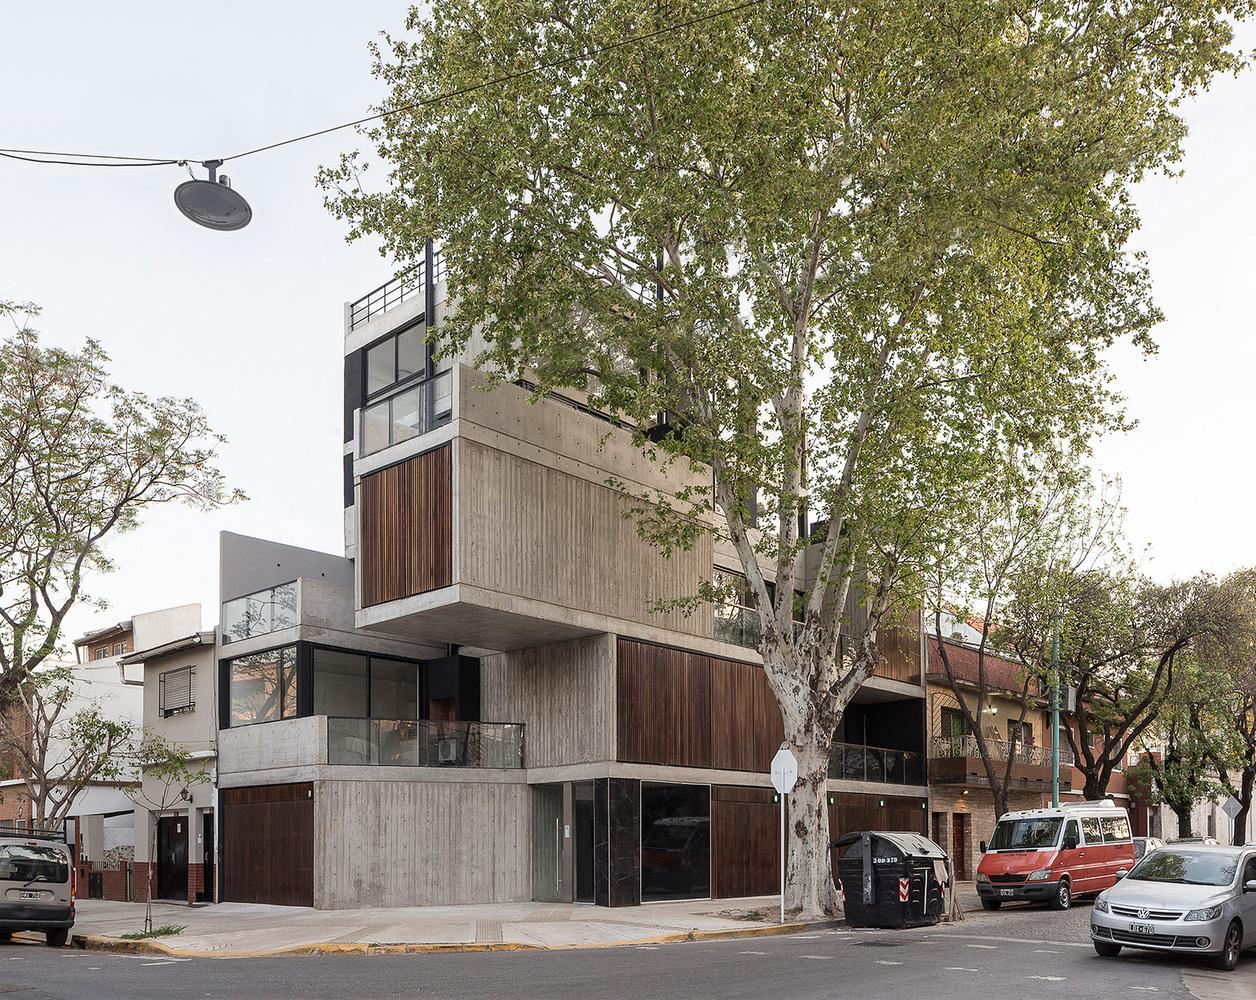 Edificio Urban Style 2 / F2M Arquitectos